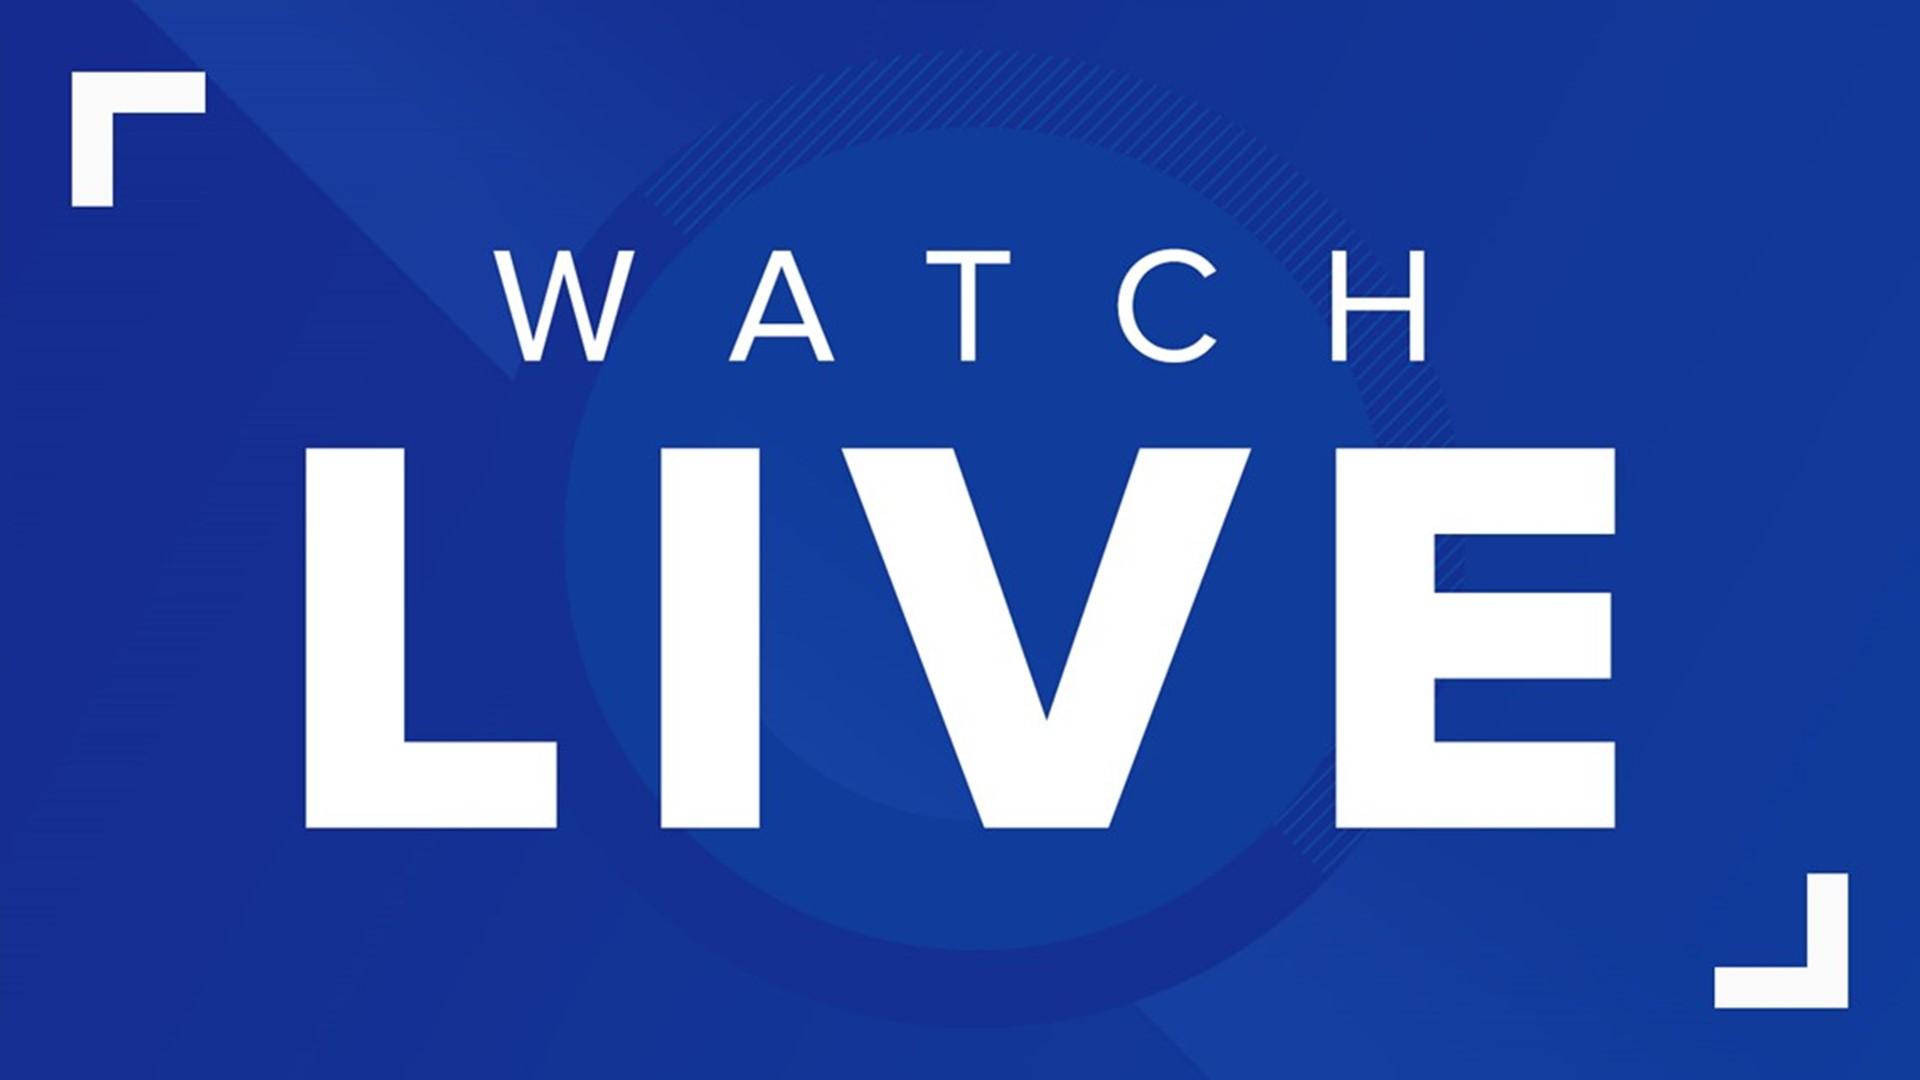 NHL Game:  Minnesota Wild vs Los Angeles Kings Live Stream Free NHL Hockey Game 2021 Online at Tantara in San Francisco - October 17, 2021 | SF Station